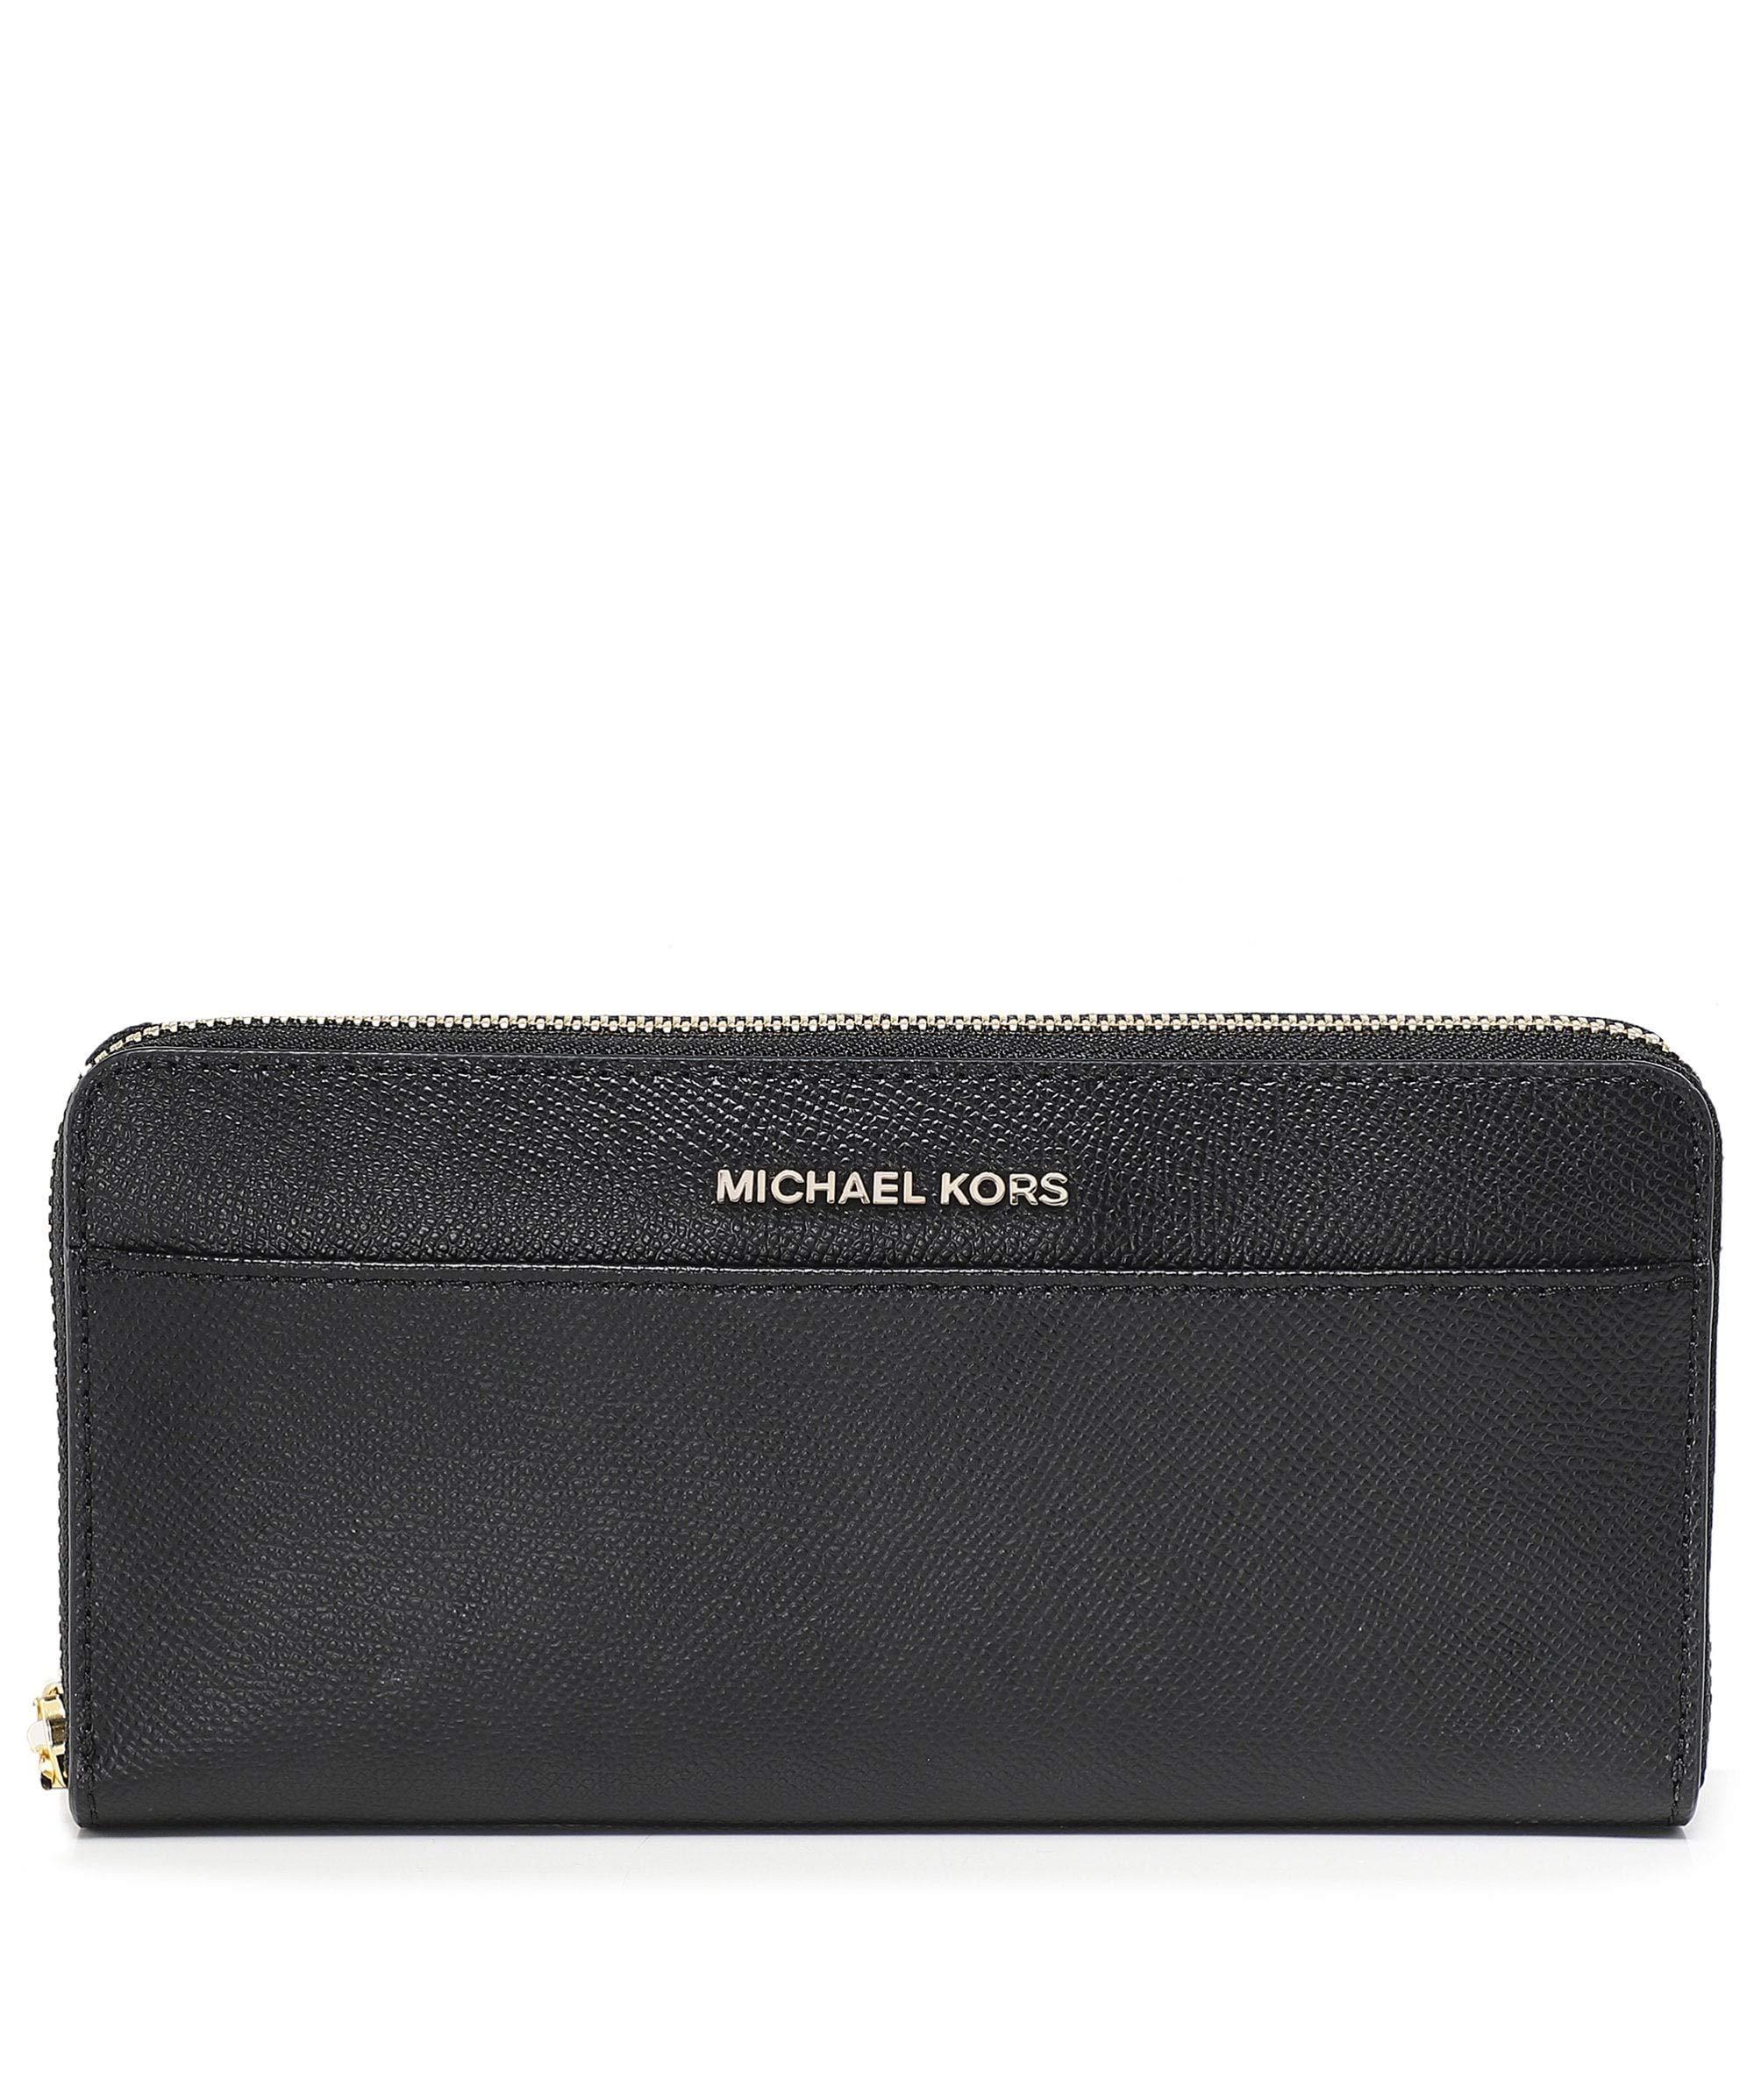 Michael Kors Women's Jet Set Saffiano Leather Pocket Continental Wallet - Black